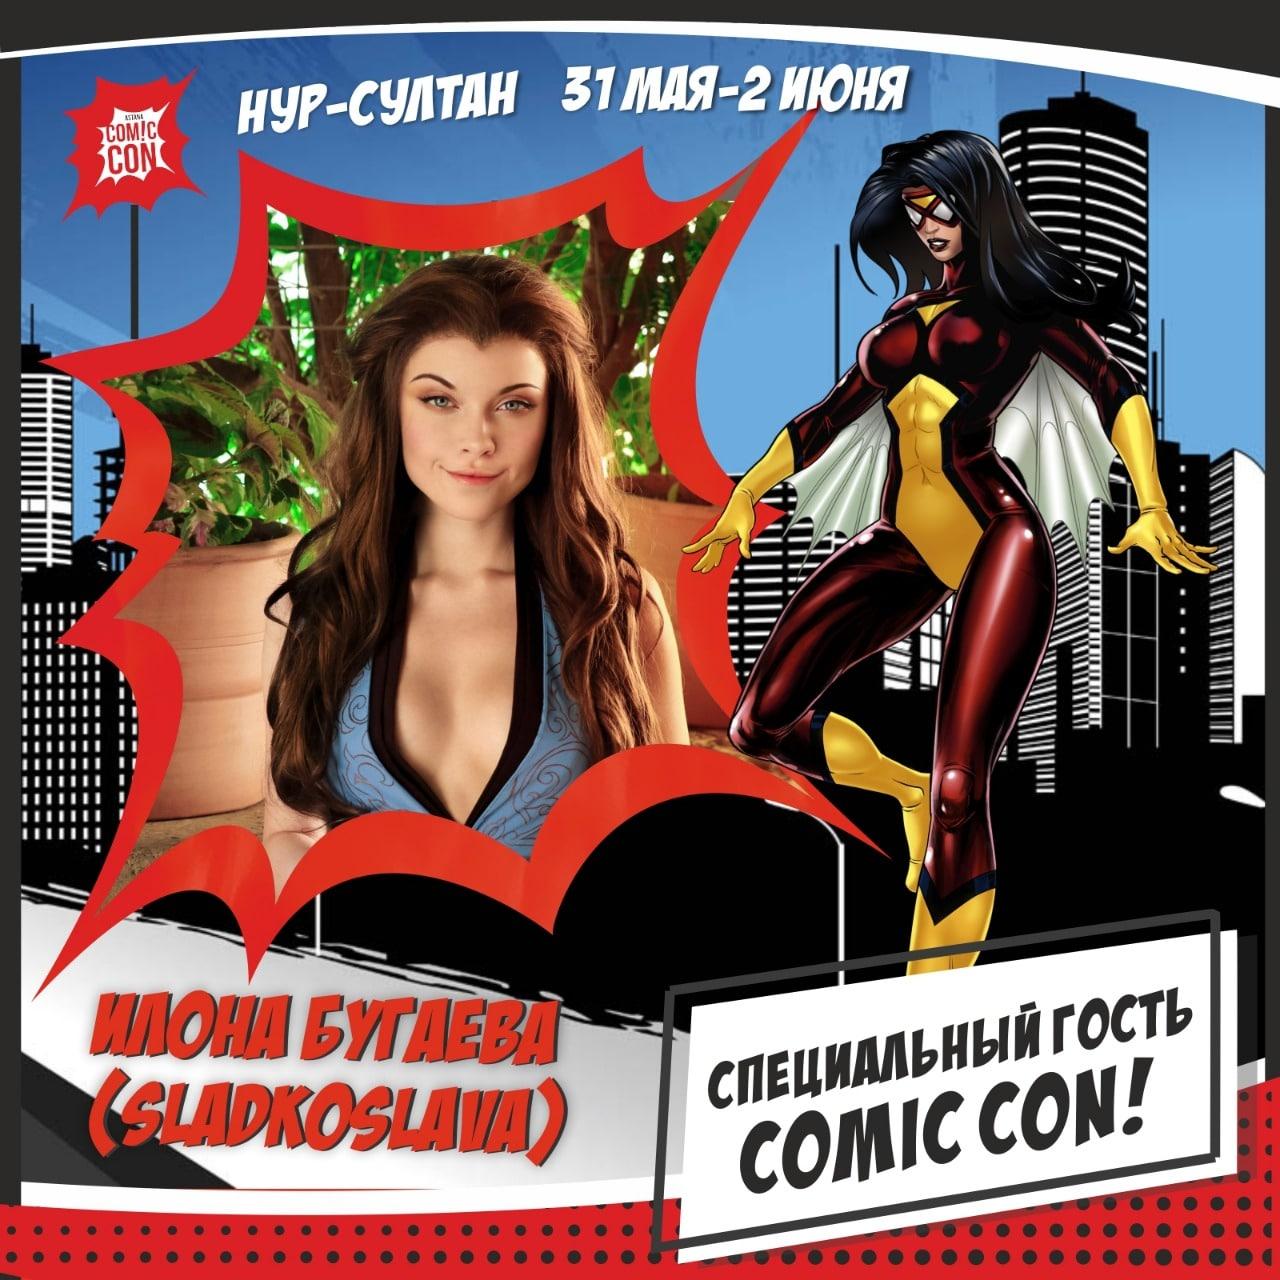 Илона Бугаева Comic con